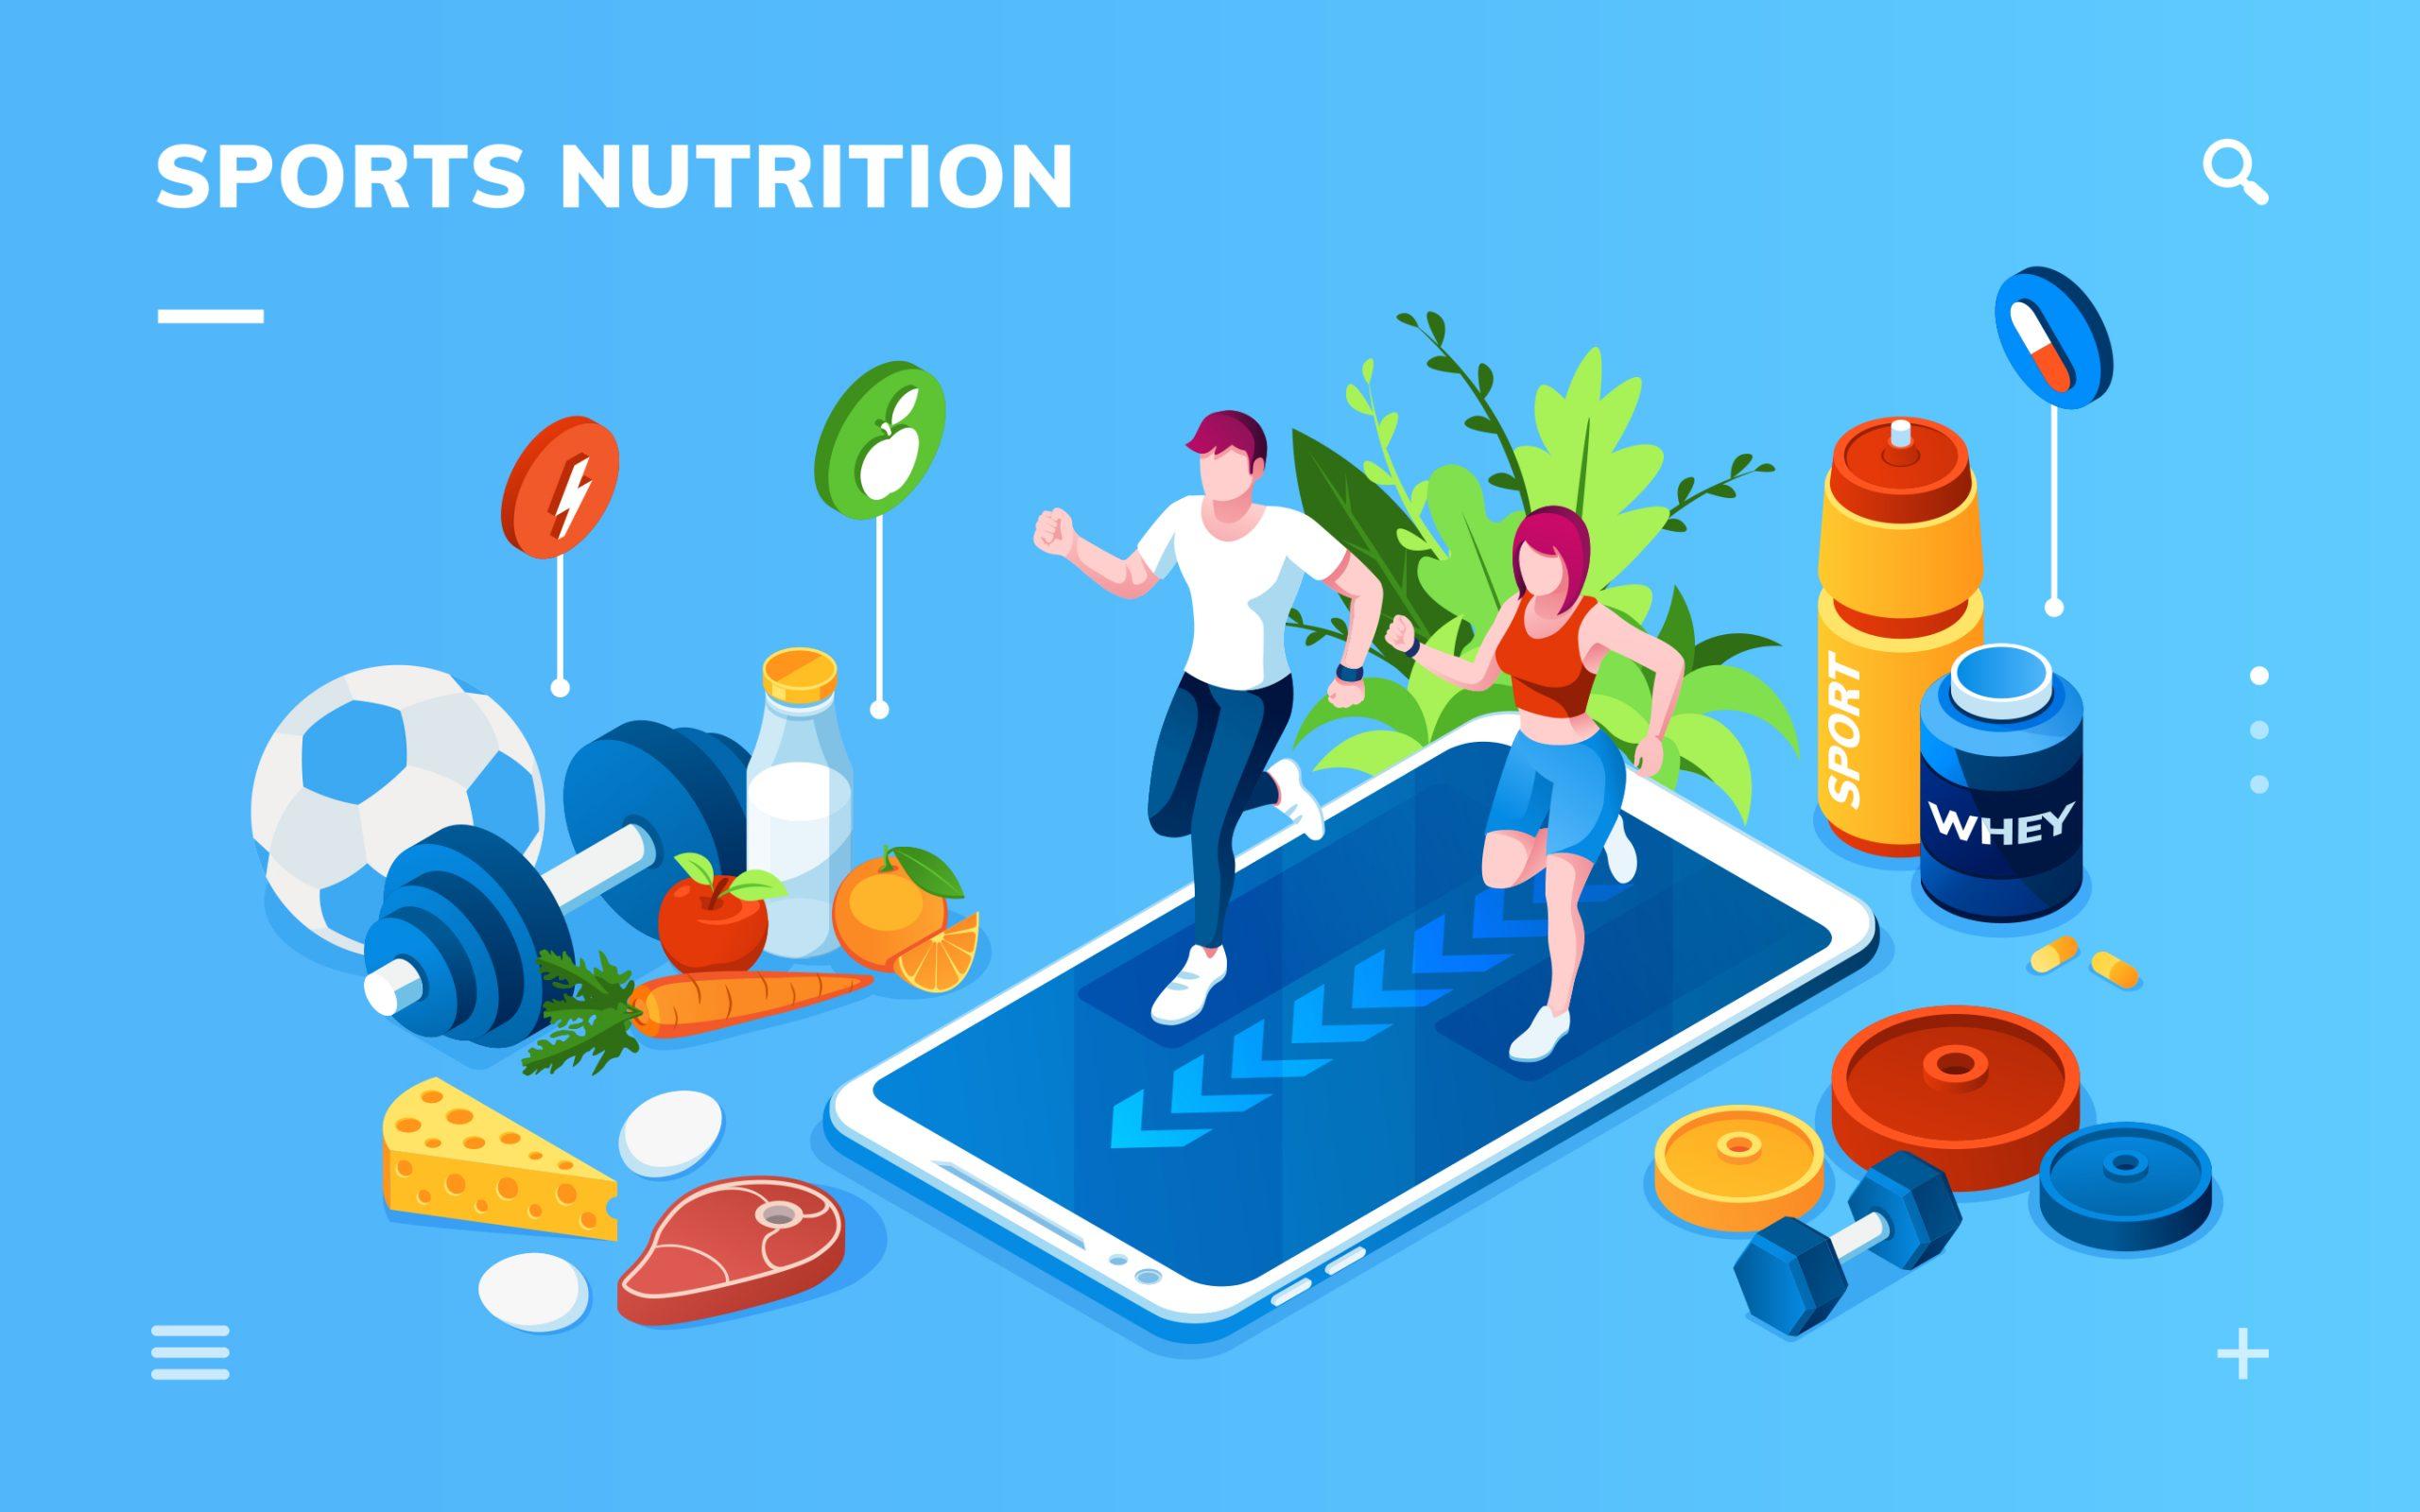 sport-et-nutrition-astuce-conseil-healthy-coaching-sportif